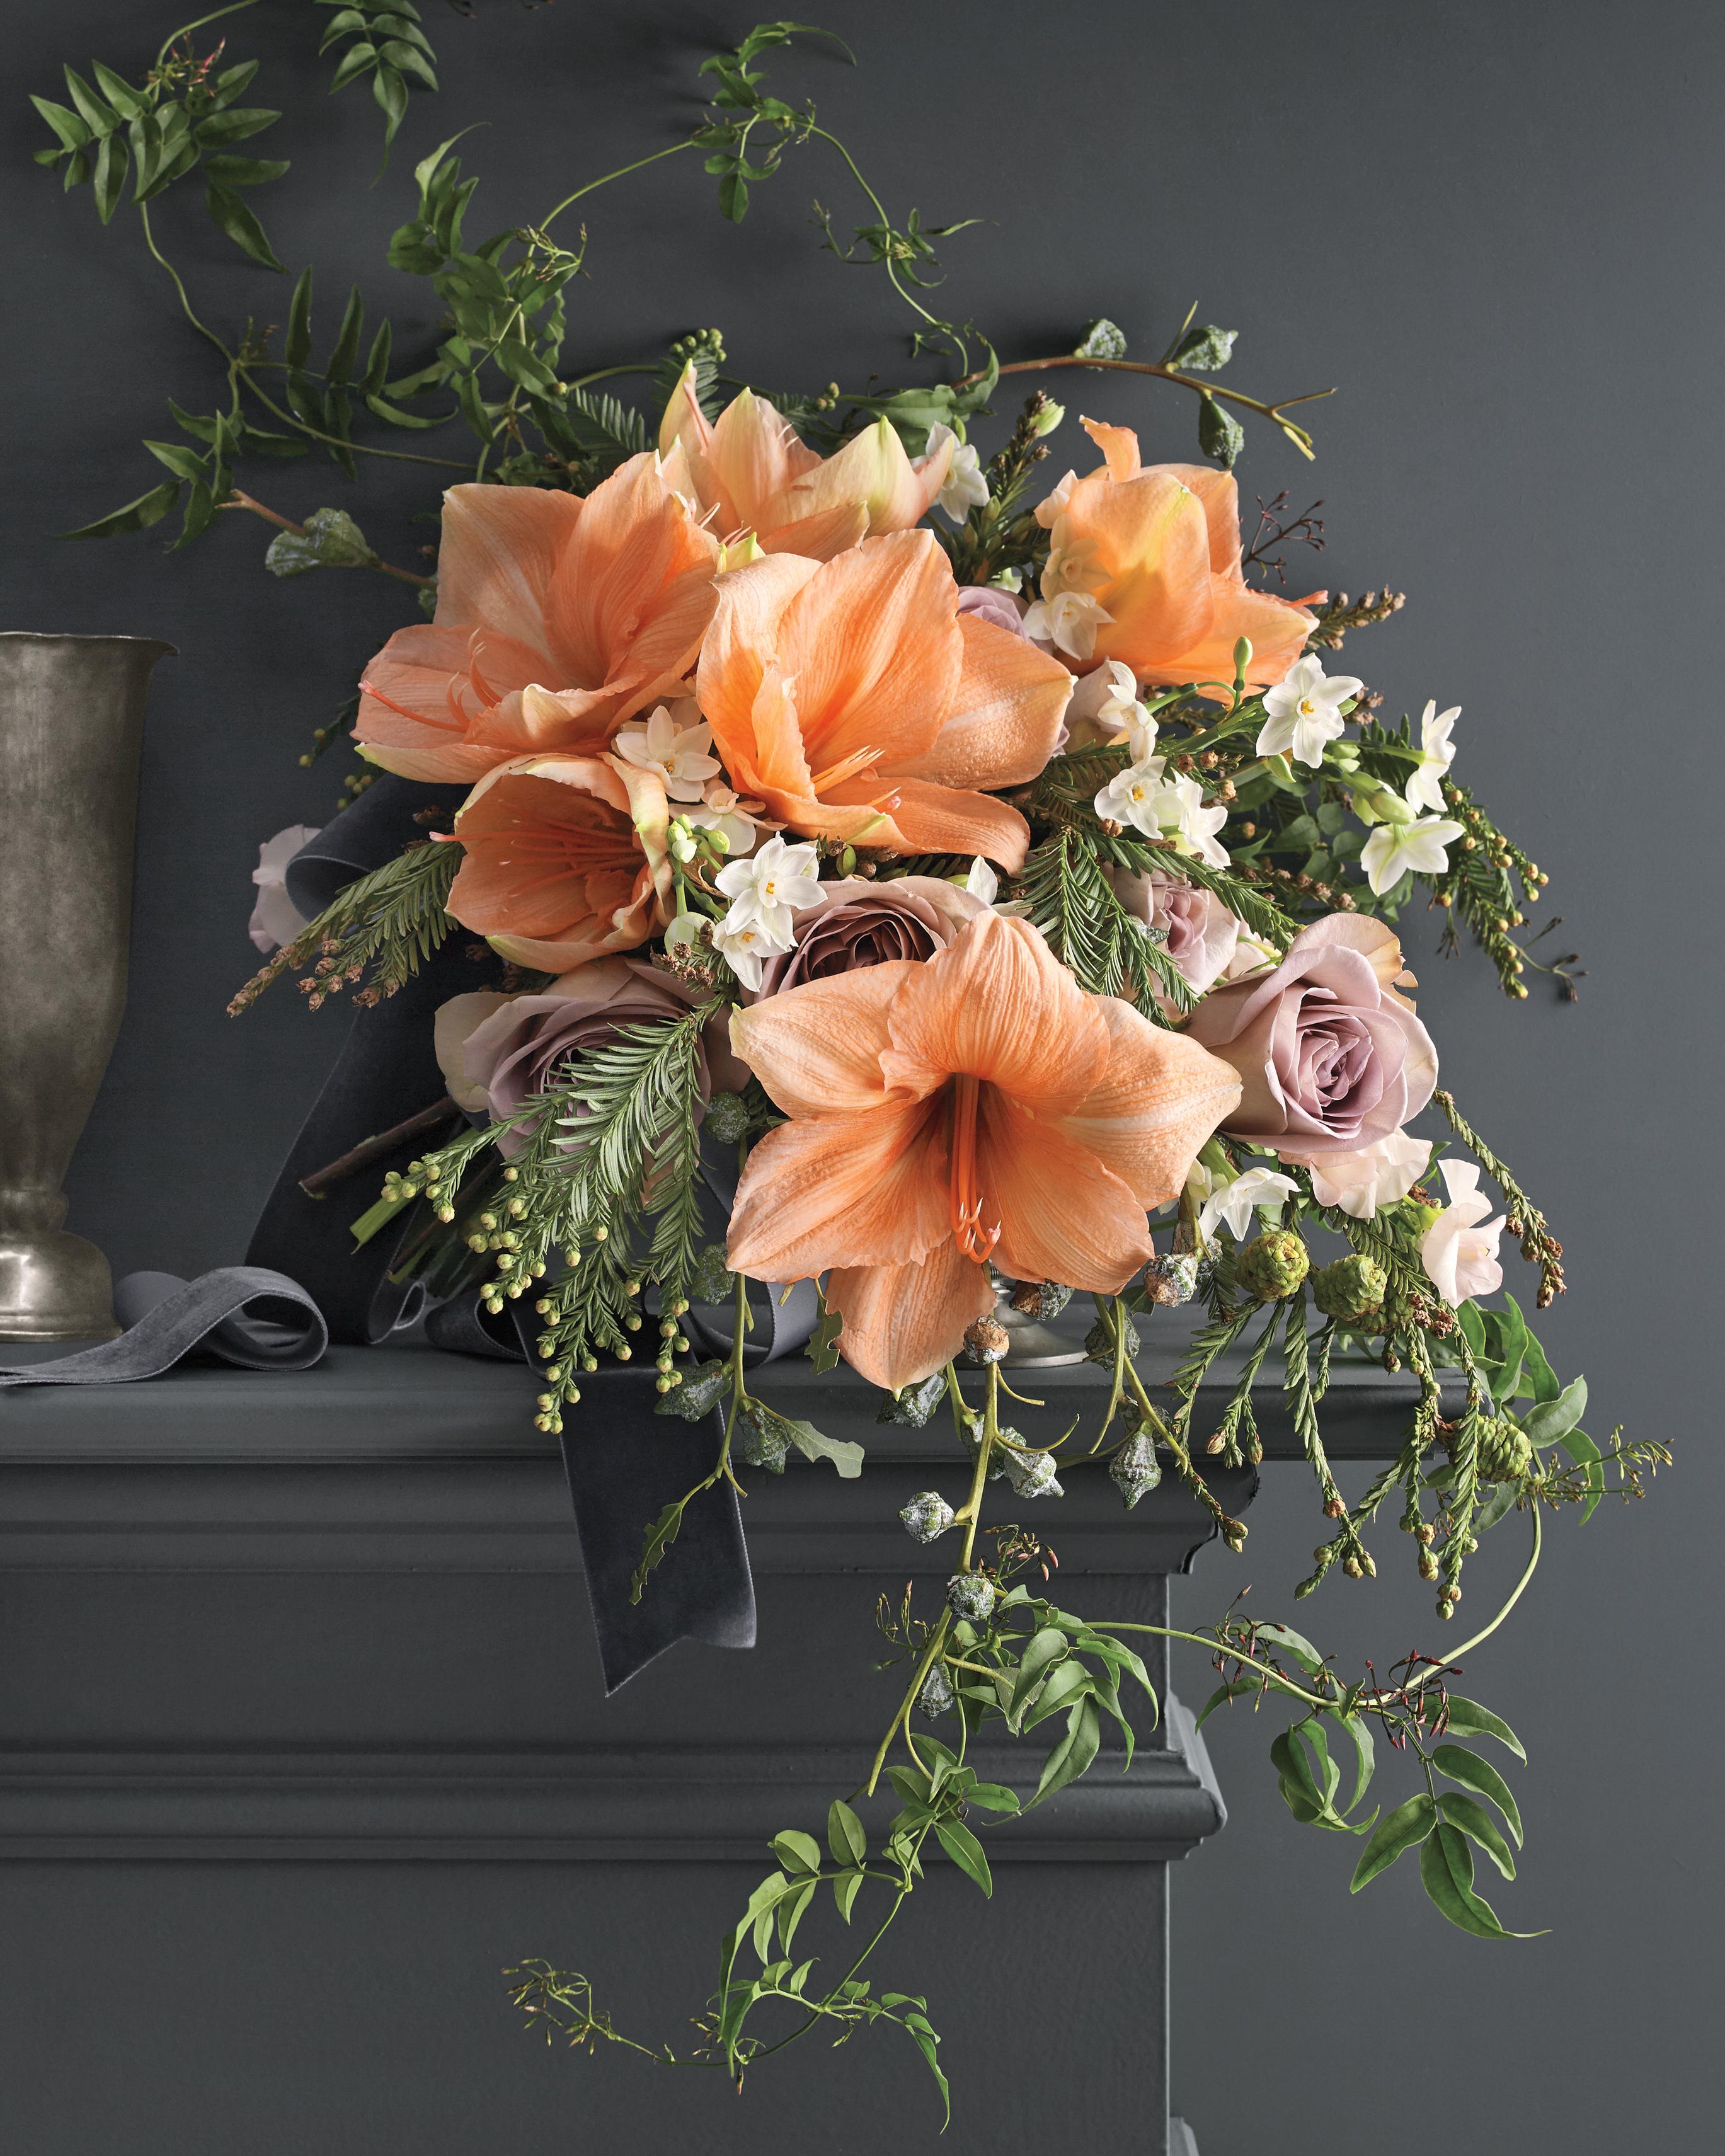 winter-2-bouquet-flowers-45508-1-d111785.jpg